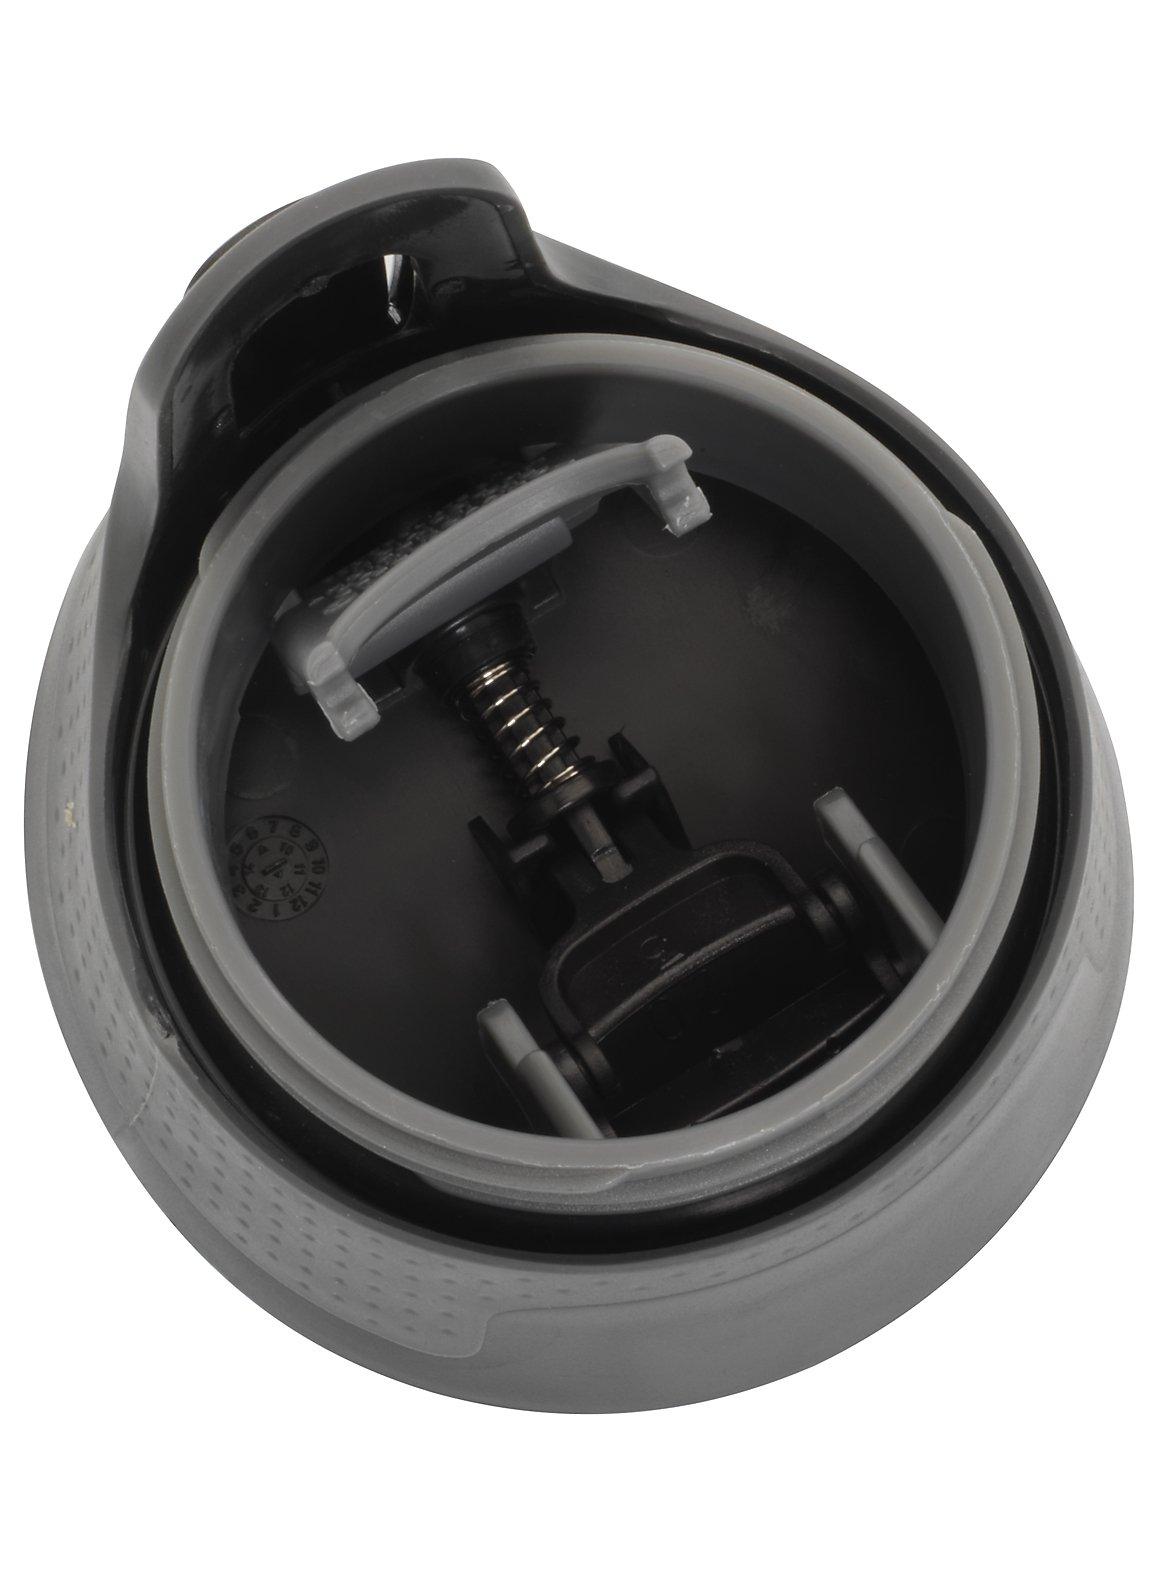 Contigo AUTOSEAL West Loop Stainless Steel Travel Mug, 20 oz, Stainless Steel by Contigo (Image #5)